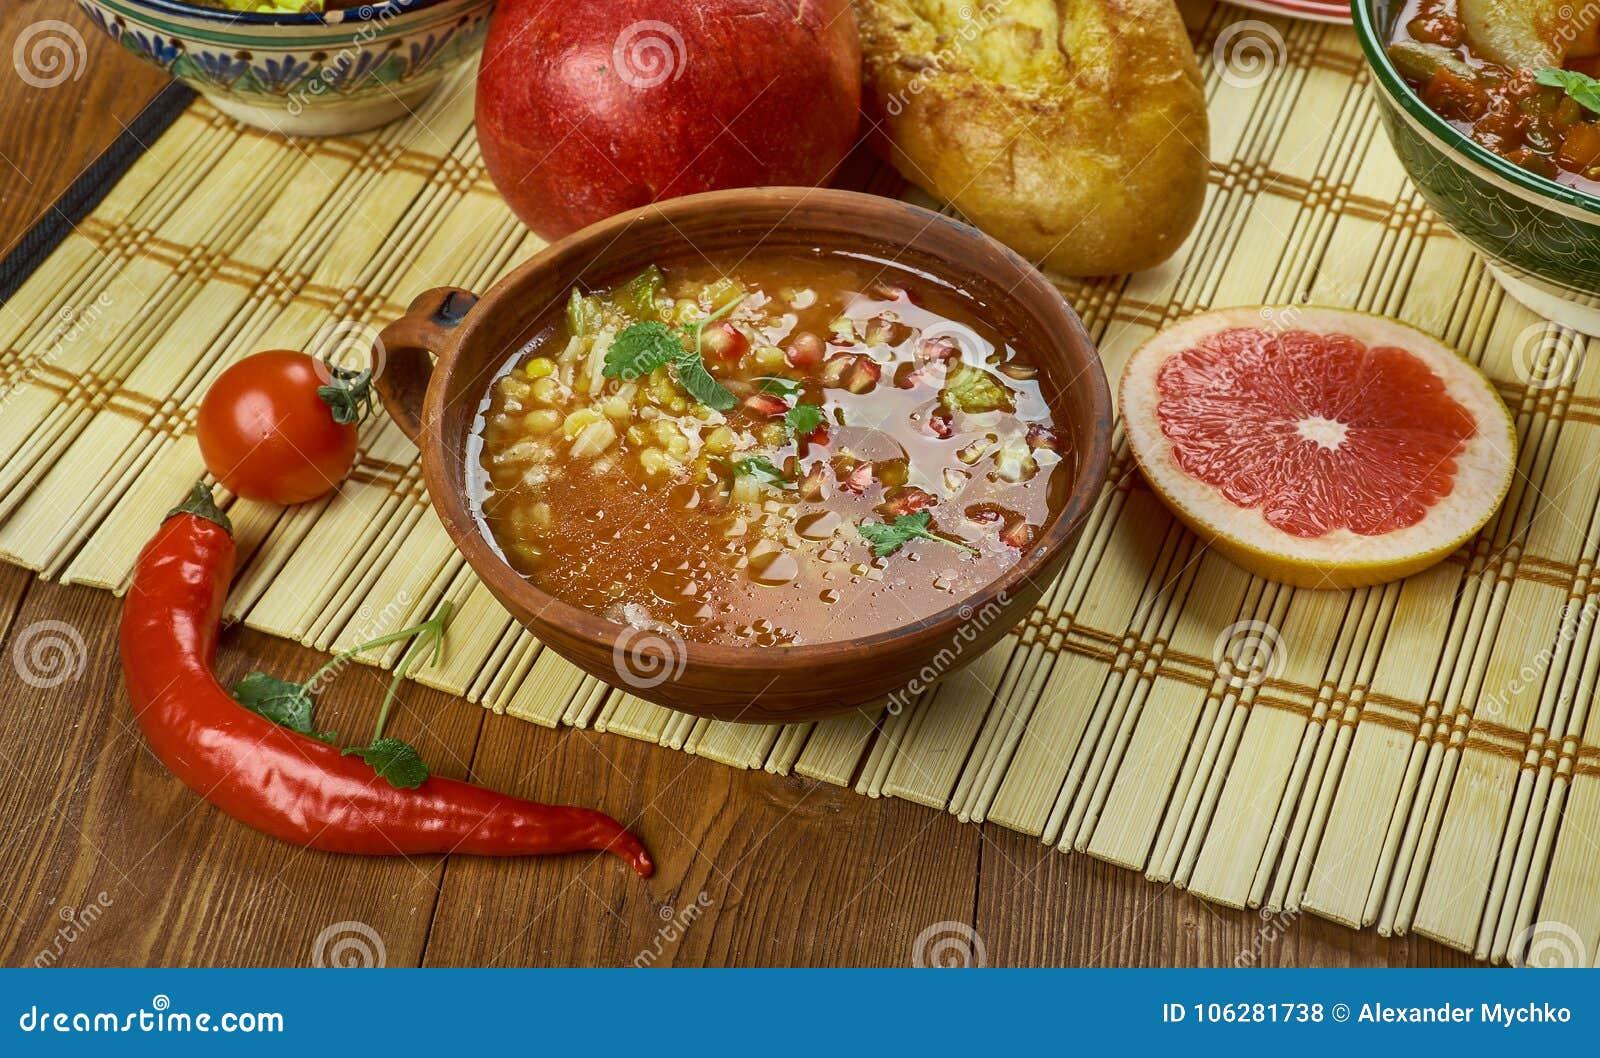 Iranian Pomegranate Soup stock photo. Image of pomegranate ... Persian Pomegranate Soup